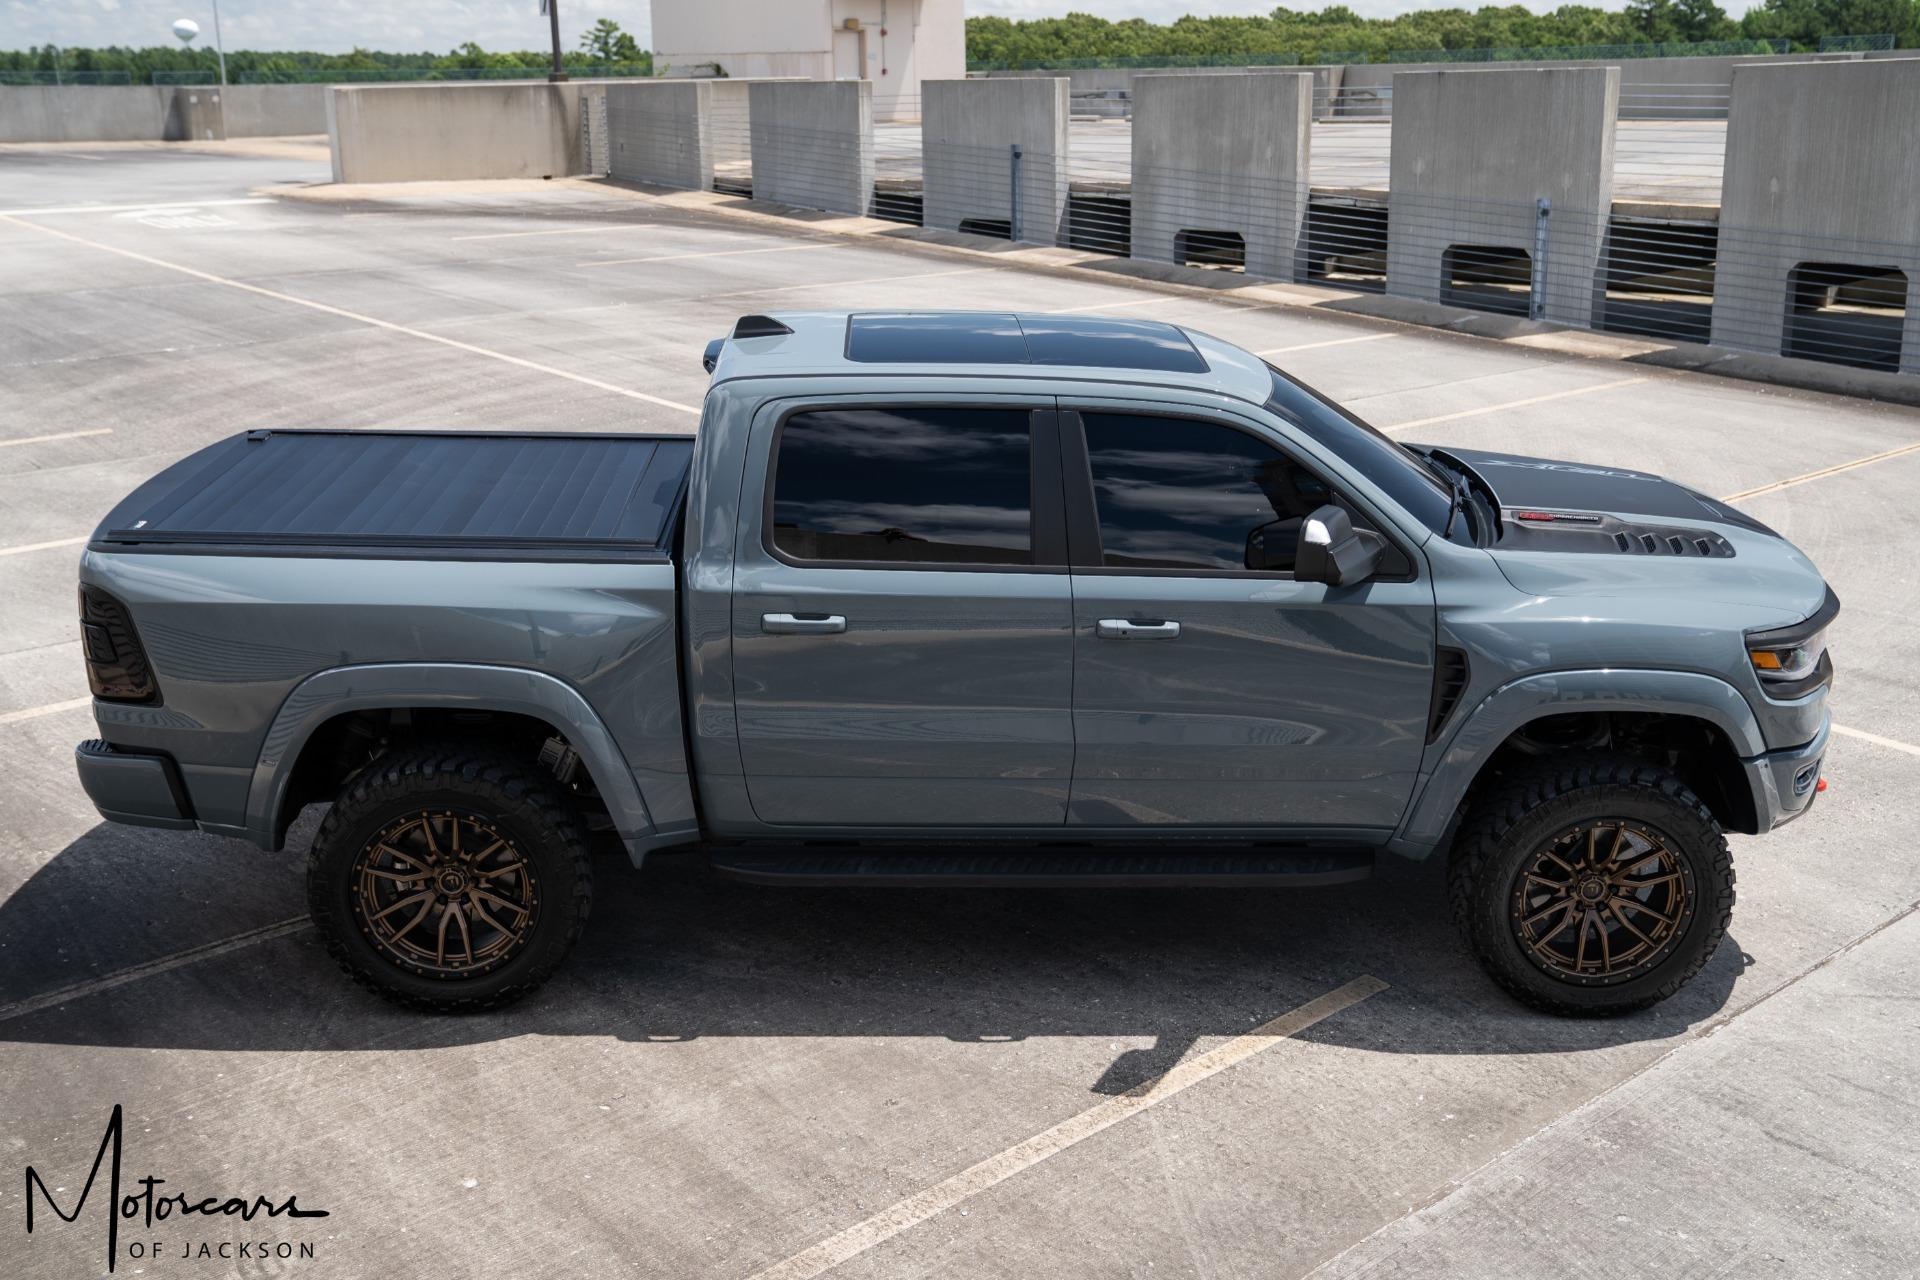 Used-2021-Ram-1500-TRX-Launch-Edition-CUSTOM-for-sale-Jackson-MS